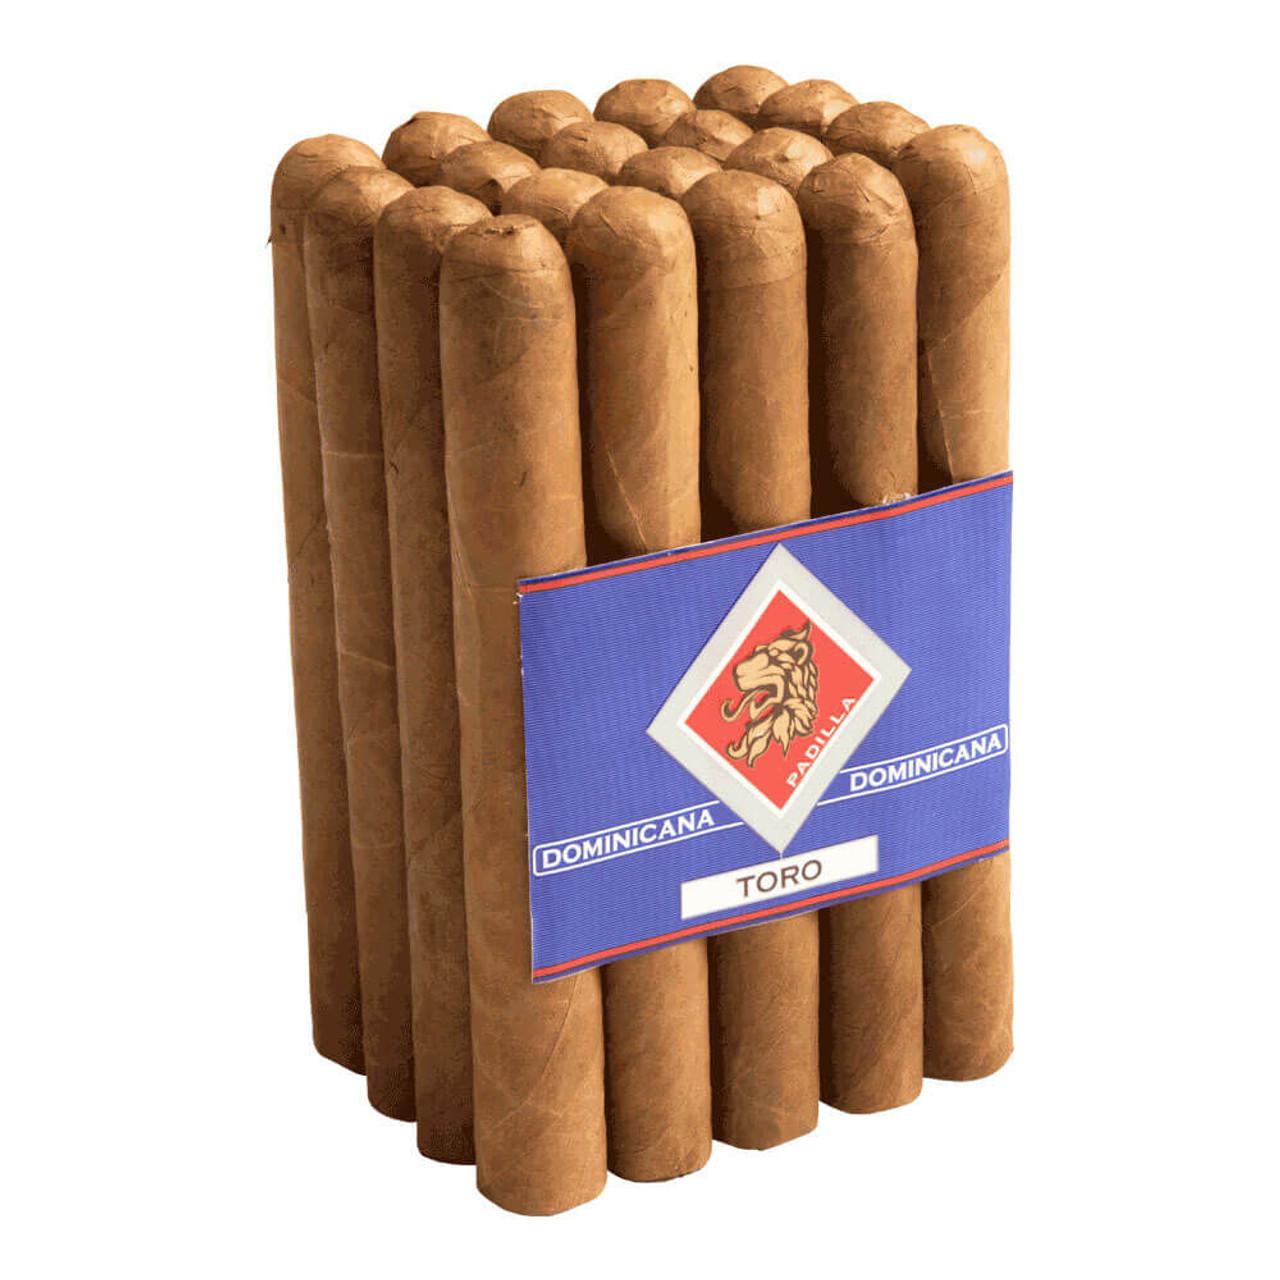 Padilla Dominicana Toro Cigars - 6.0 x 50 (Bundle of 20)